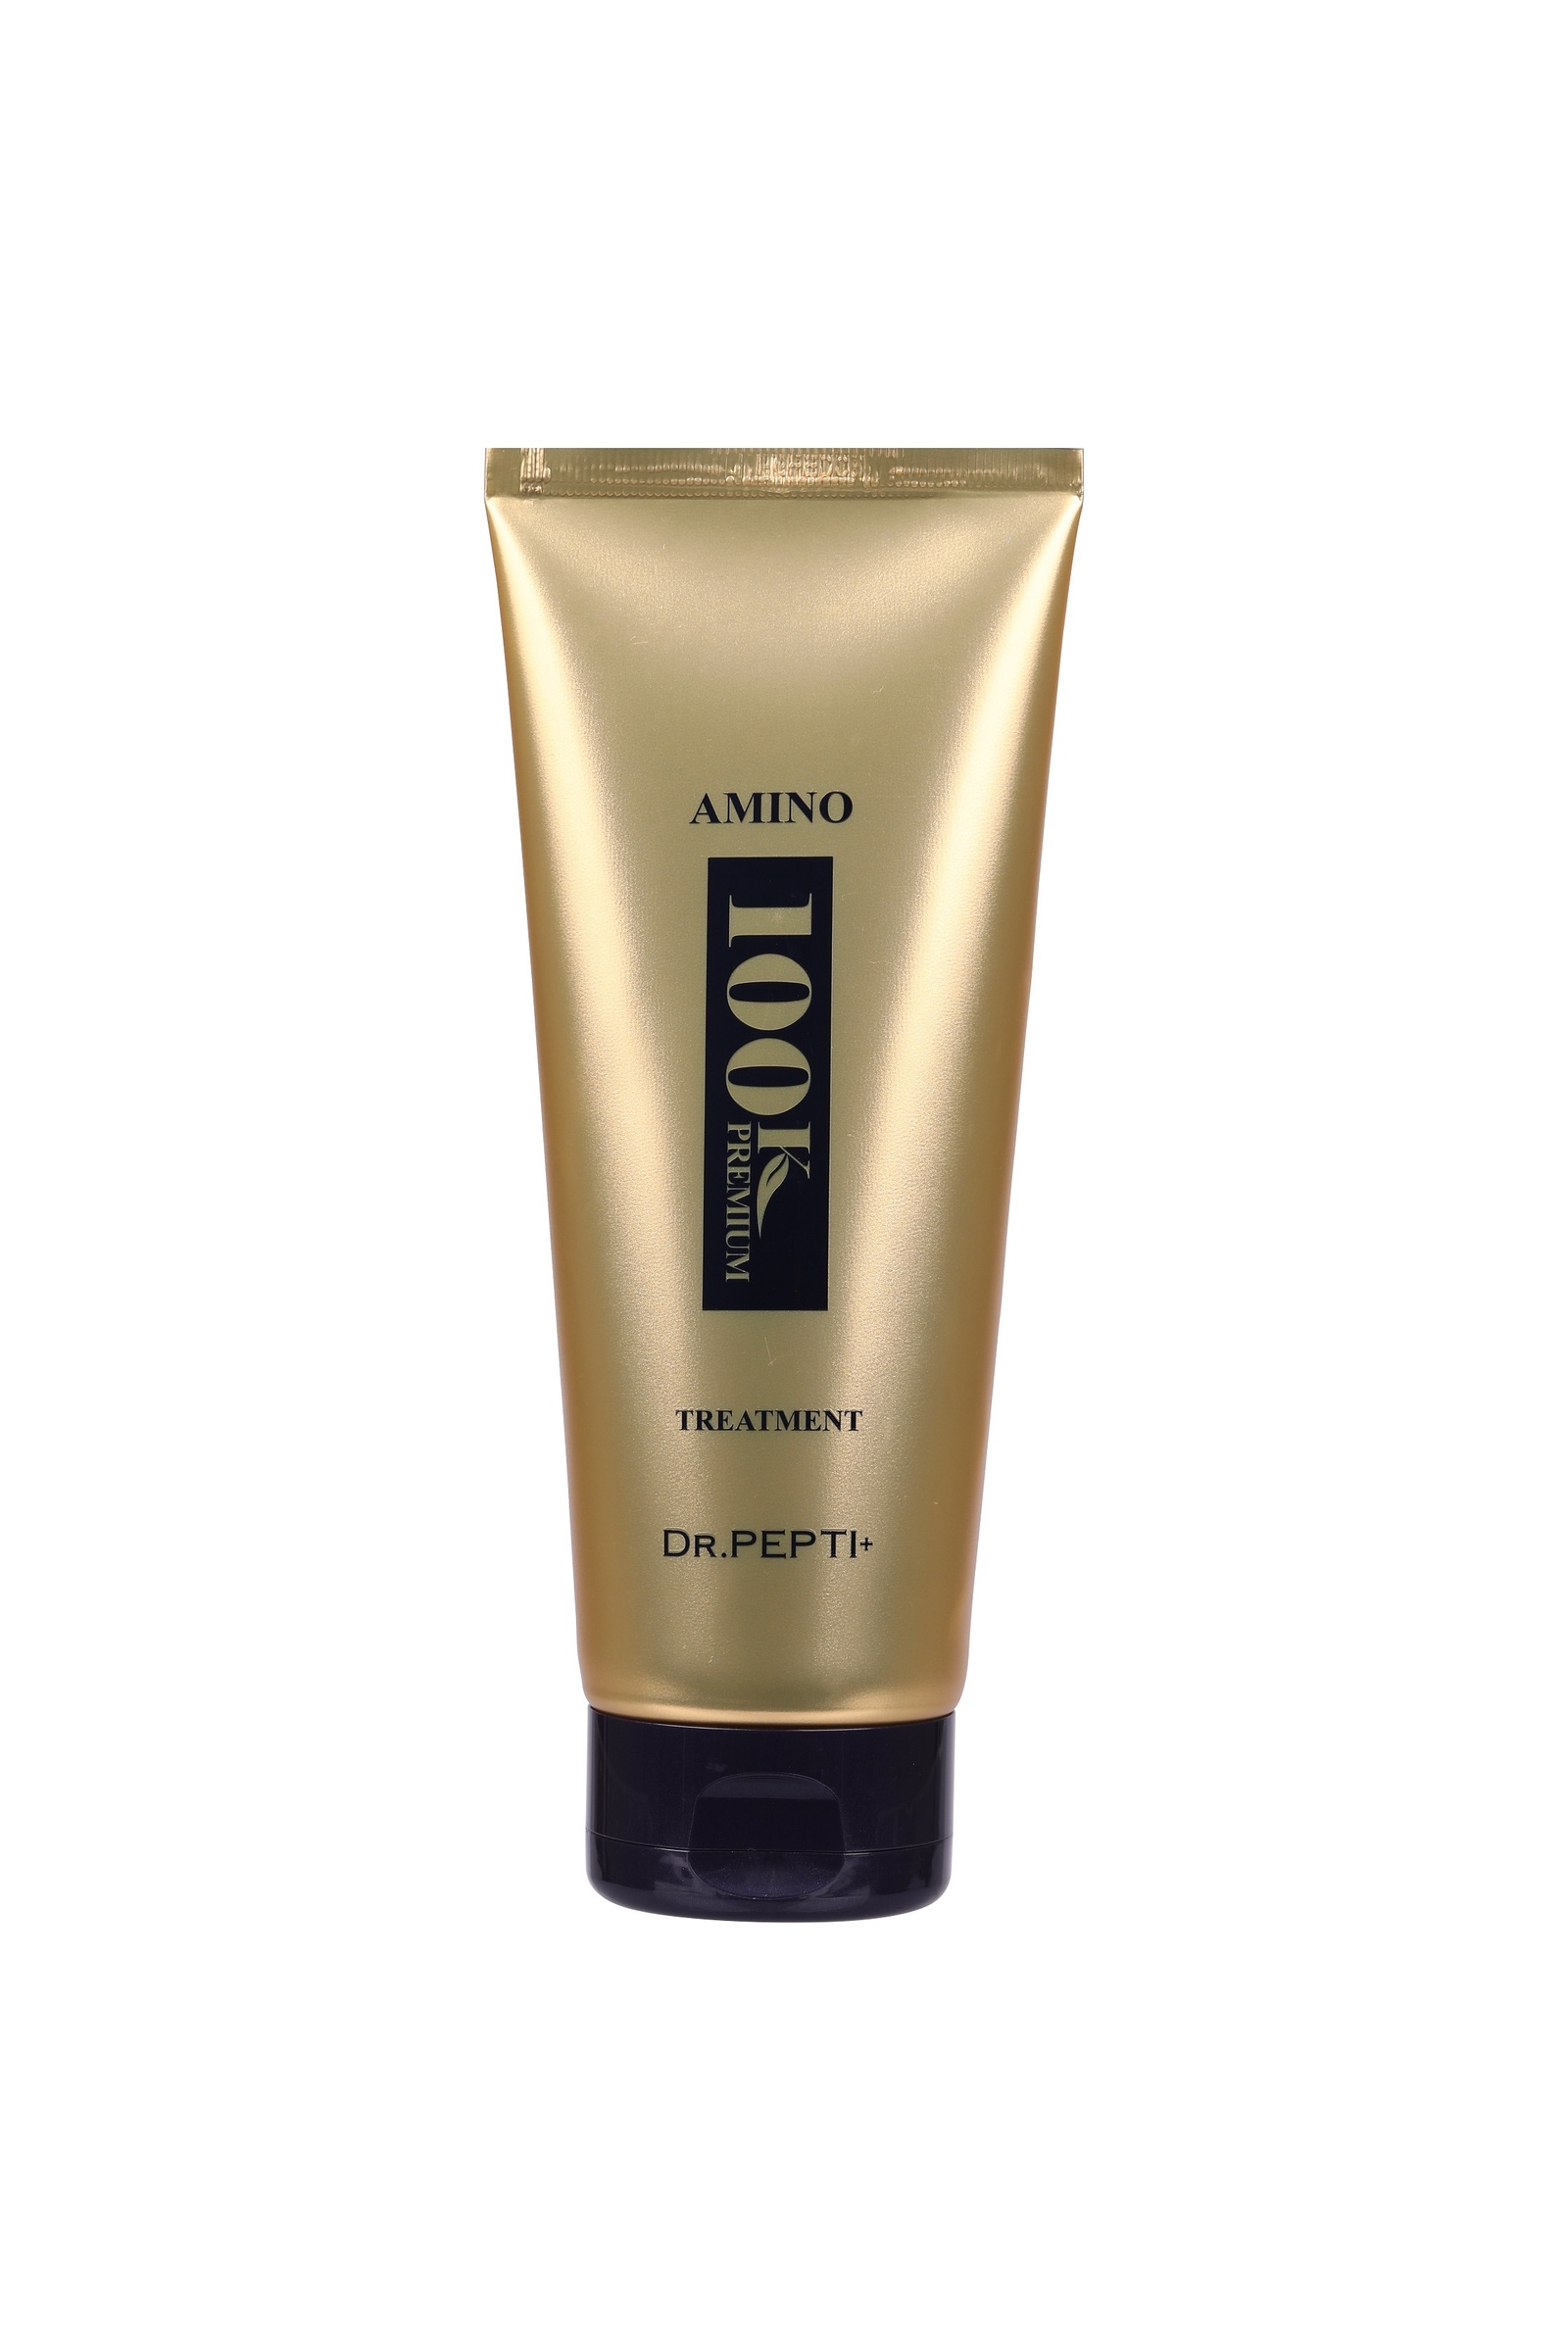 Бальзам для волос Dr. Pepti+ AMINO 100K PREMIUM TREATMENT